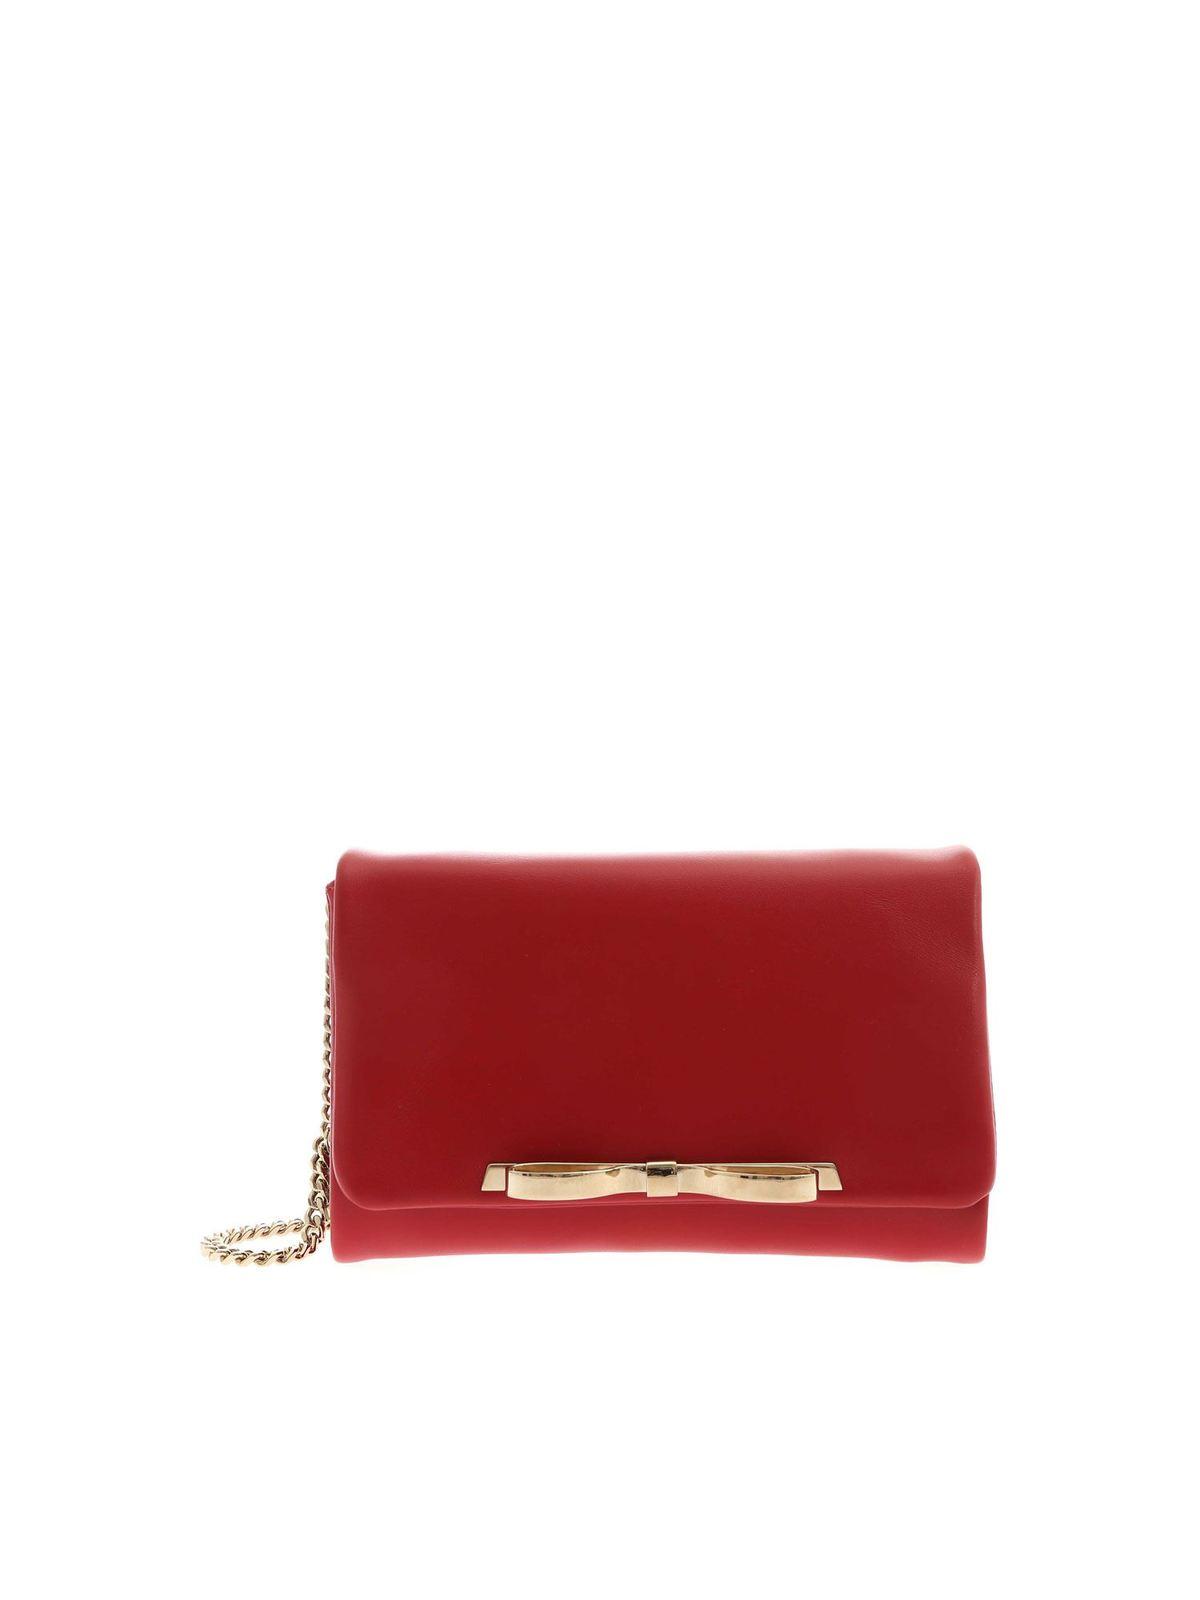 Red Valentino GOLDEN BOW SHOULDER BAG IN RED